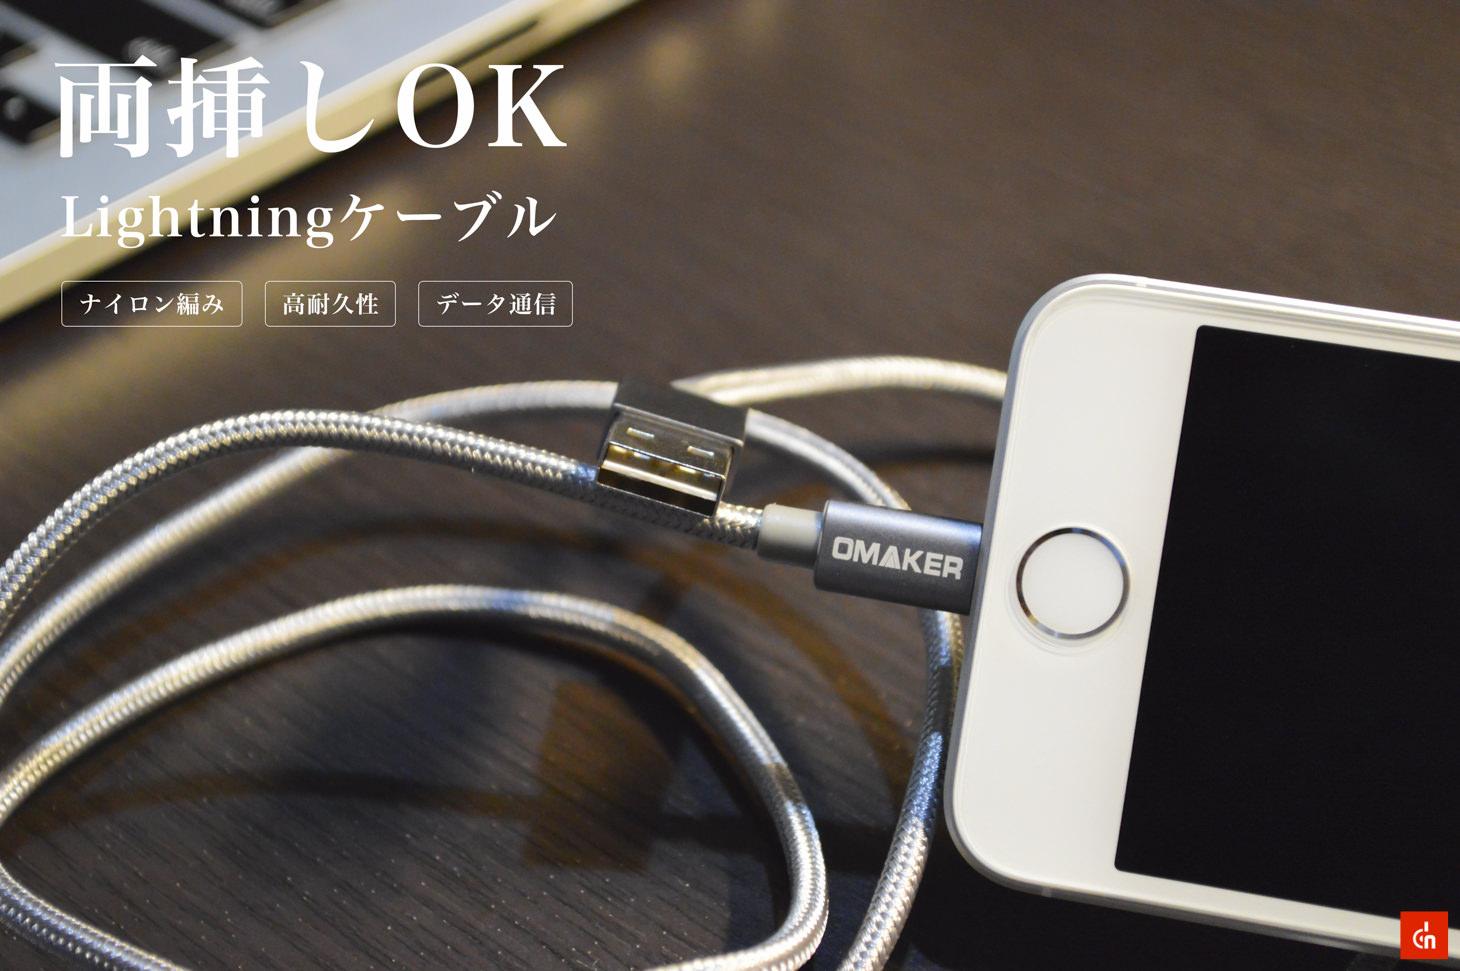 012_20160605_Lightning-cable-omaker